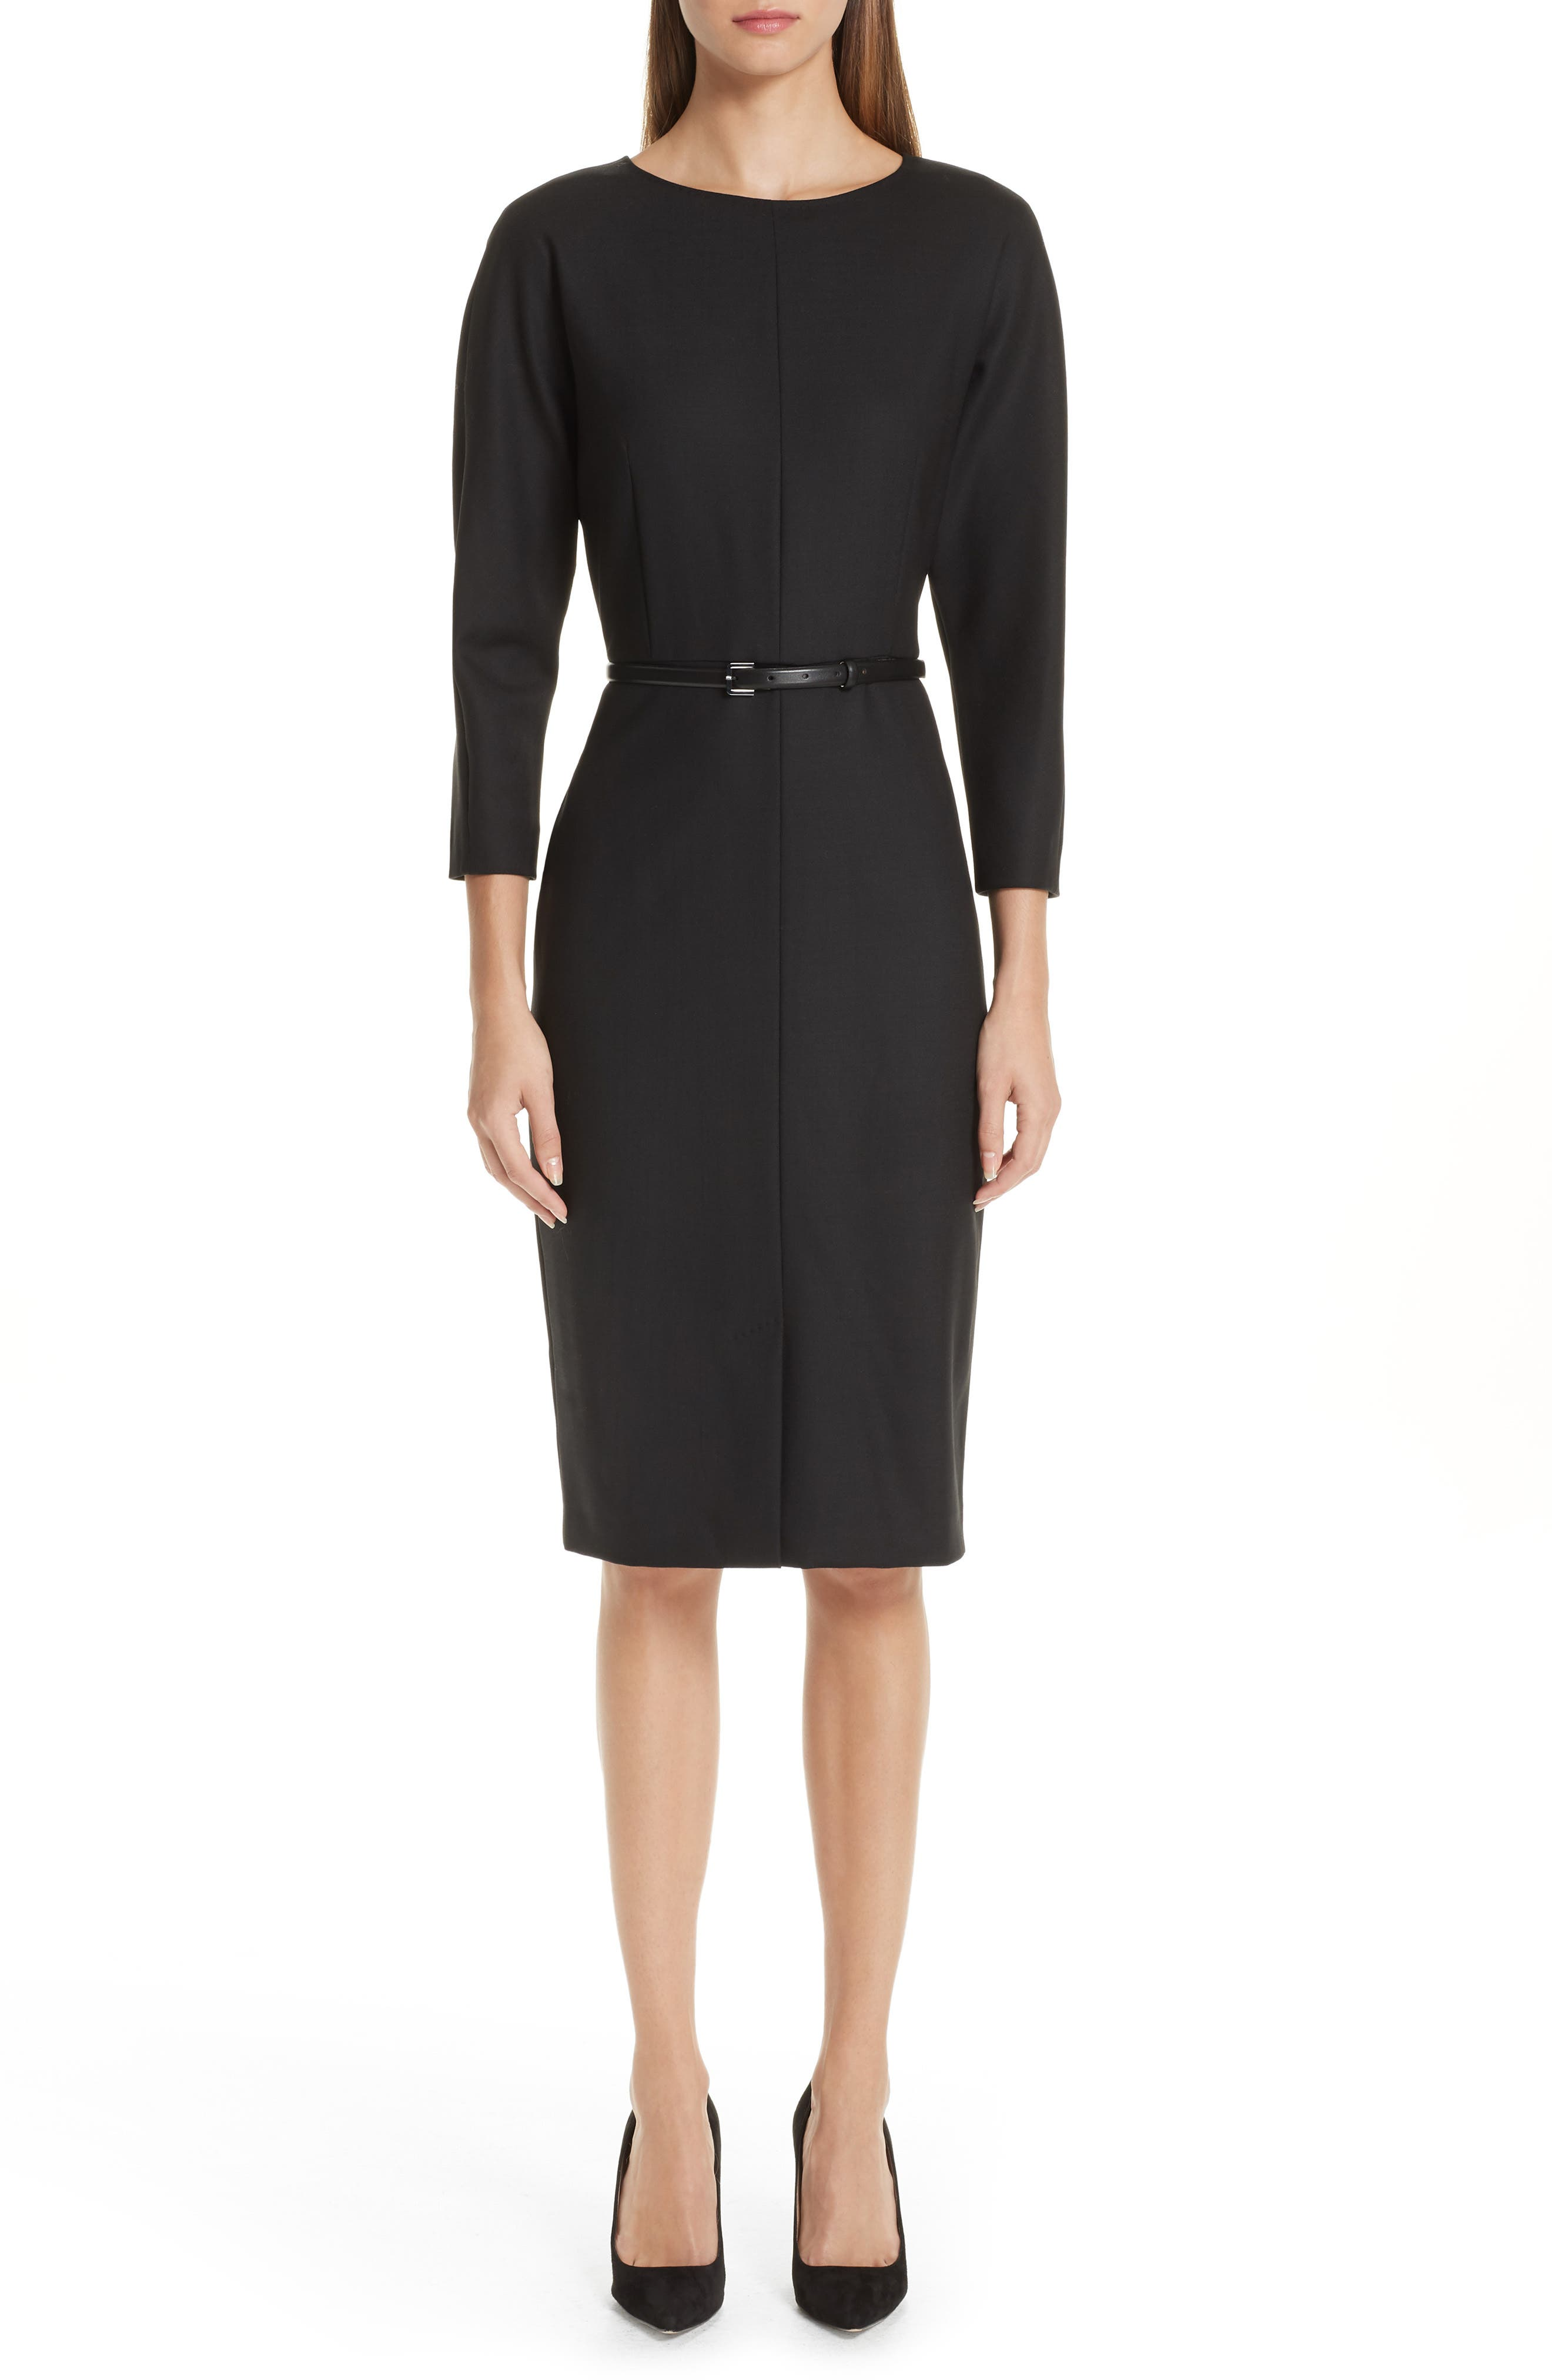 MAX MARA Karub Belted Stretch Wool Dress, Main, color, 001